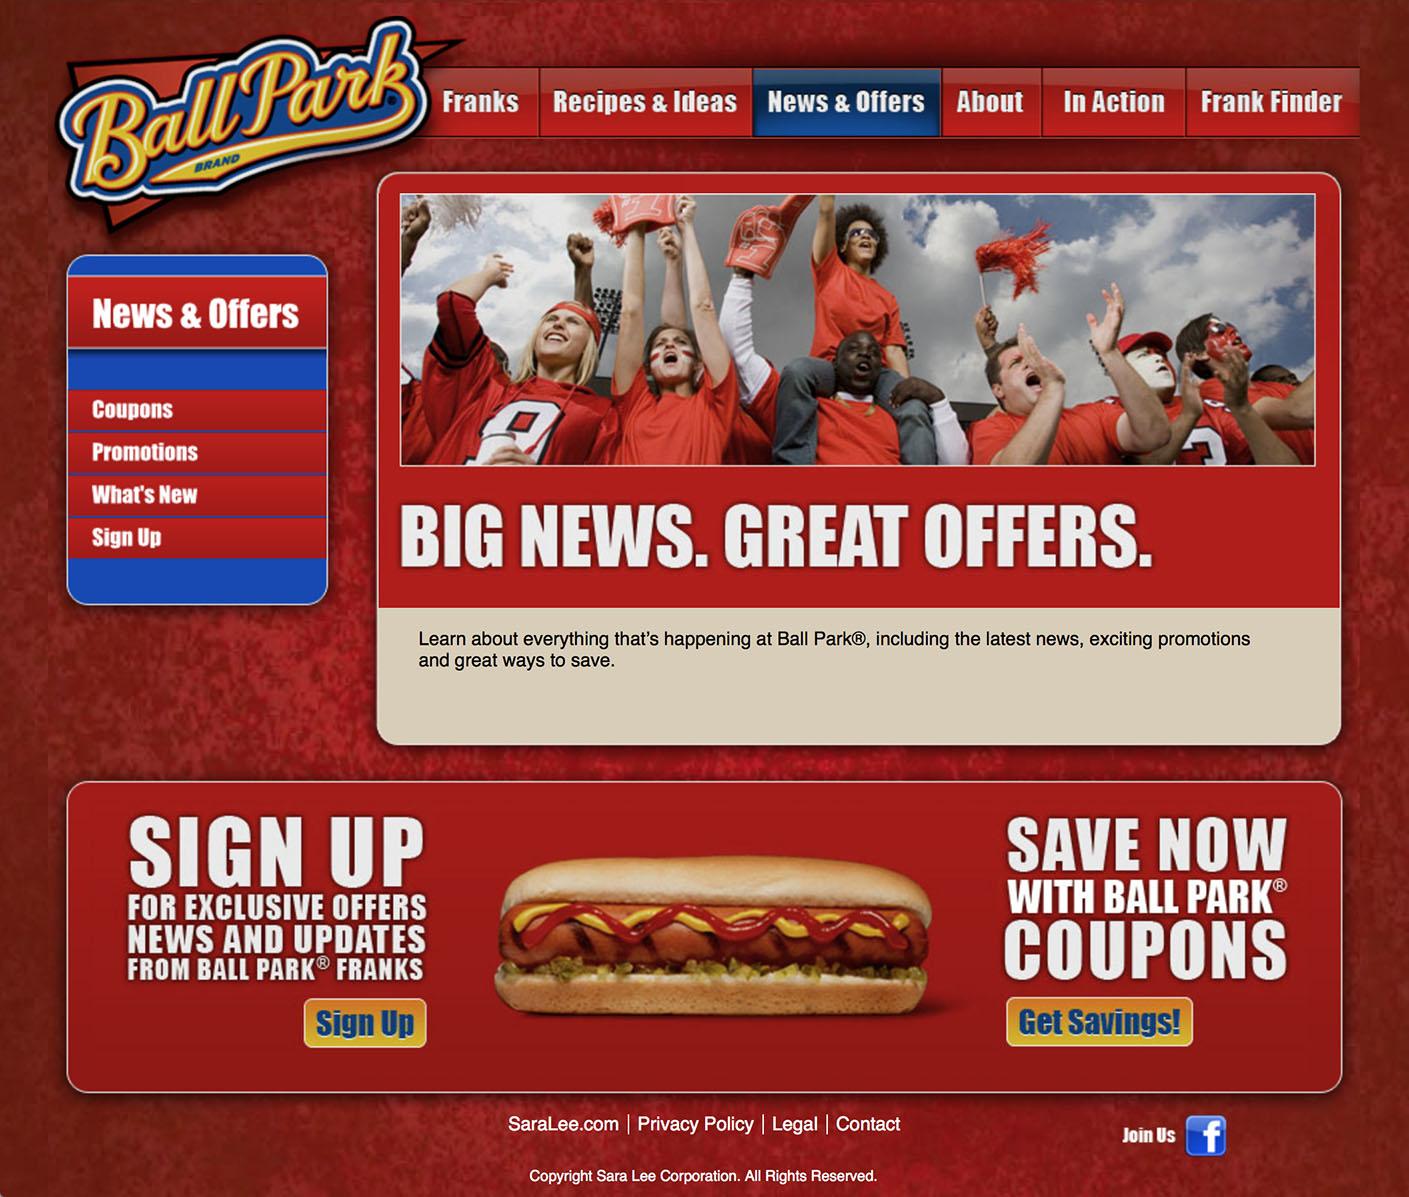 Ball Park: Website – 4 News and Offers